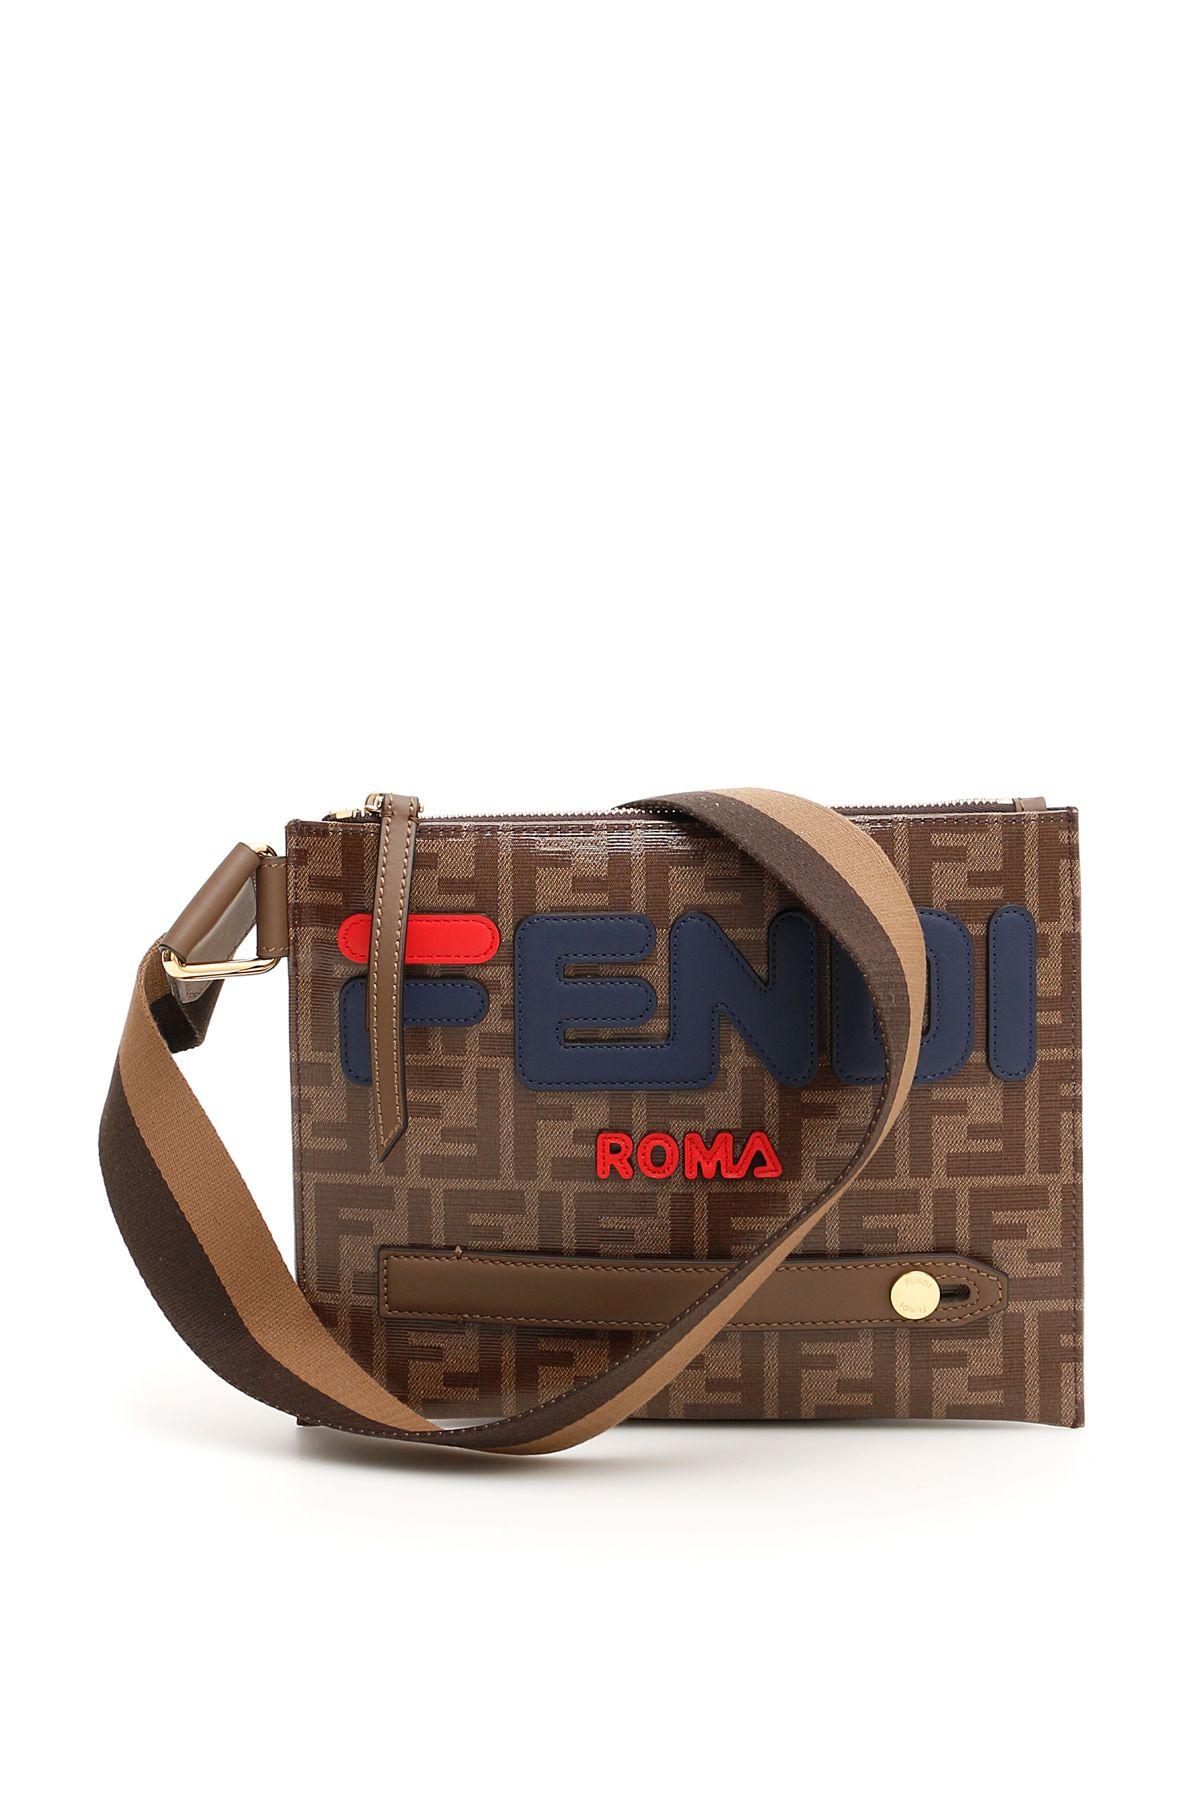 Fendi Fendi Mania Messenger Bag